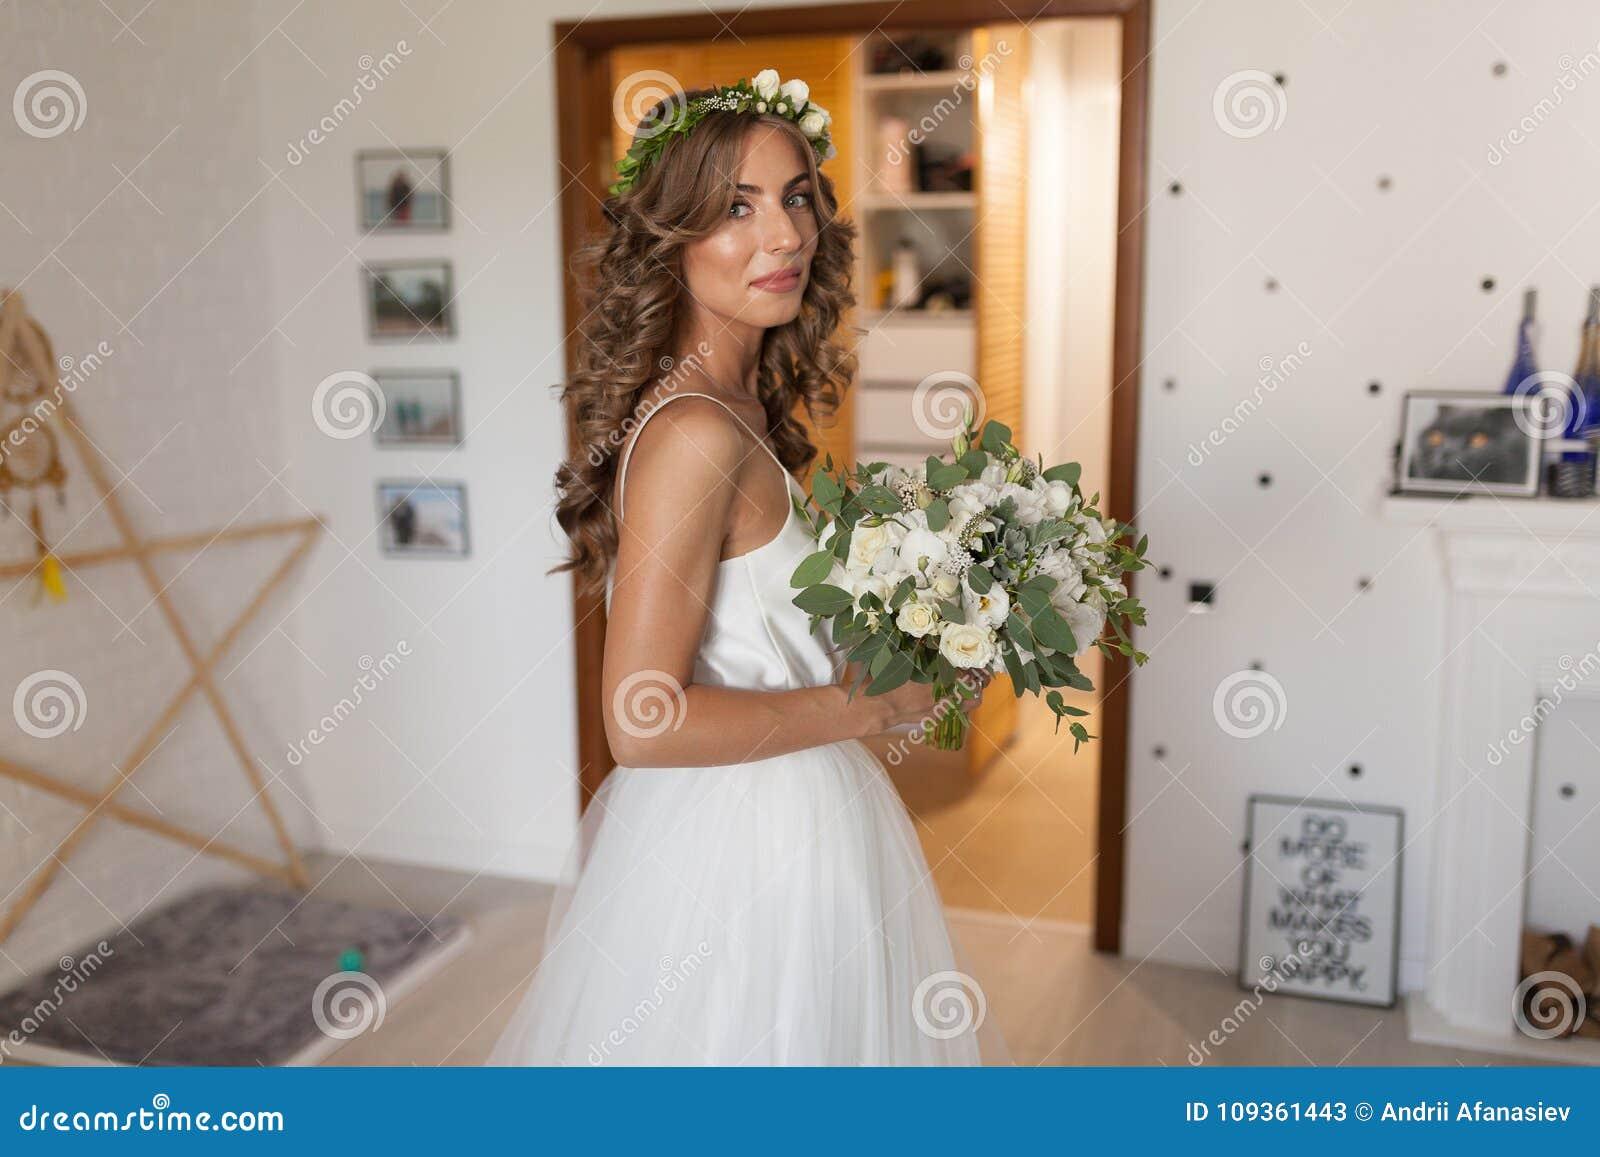 Wedding Flowers In Bride Hands In Interior Bride In A Designer D